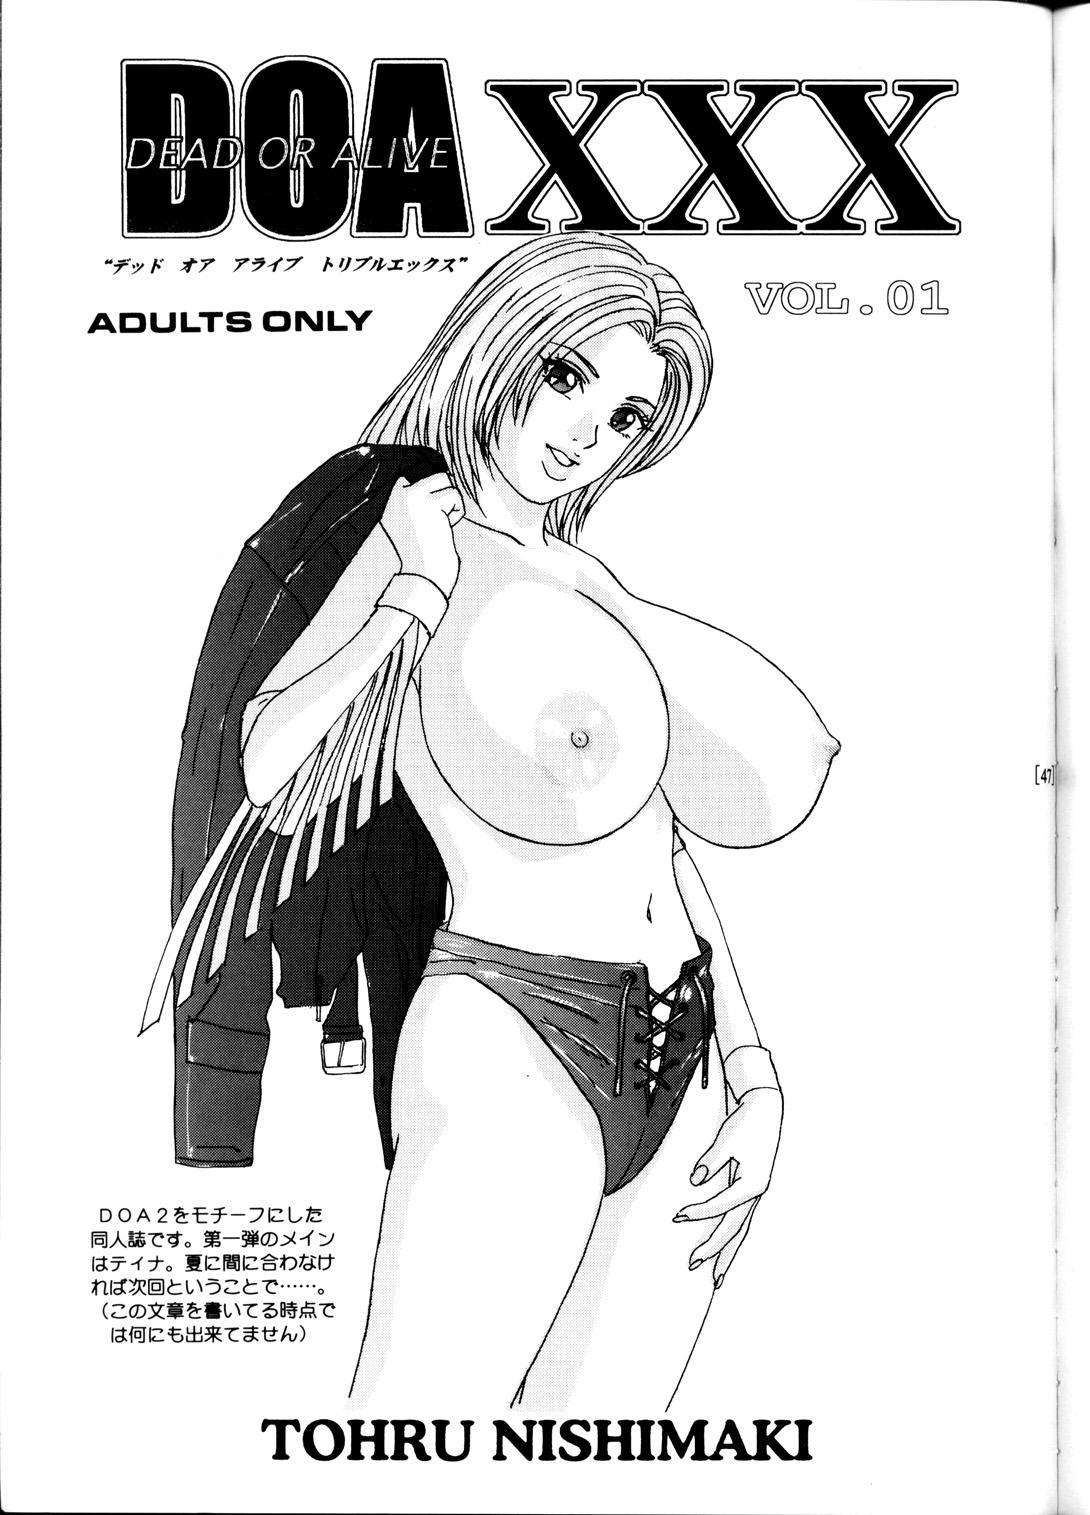 (C60) [D-LOVERS (Nishimaki Tohru)] Mai -Innyuuden- Daiichigou (King of Fighters) 45